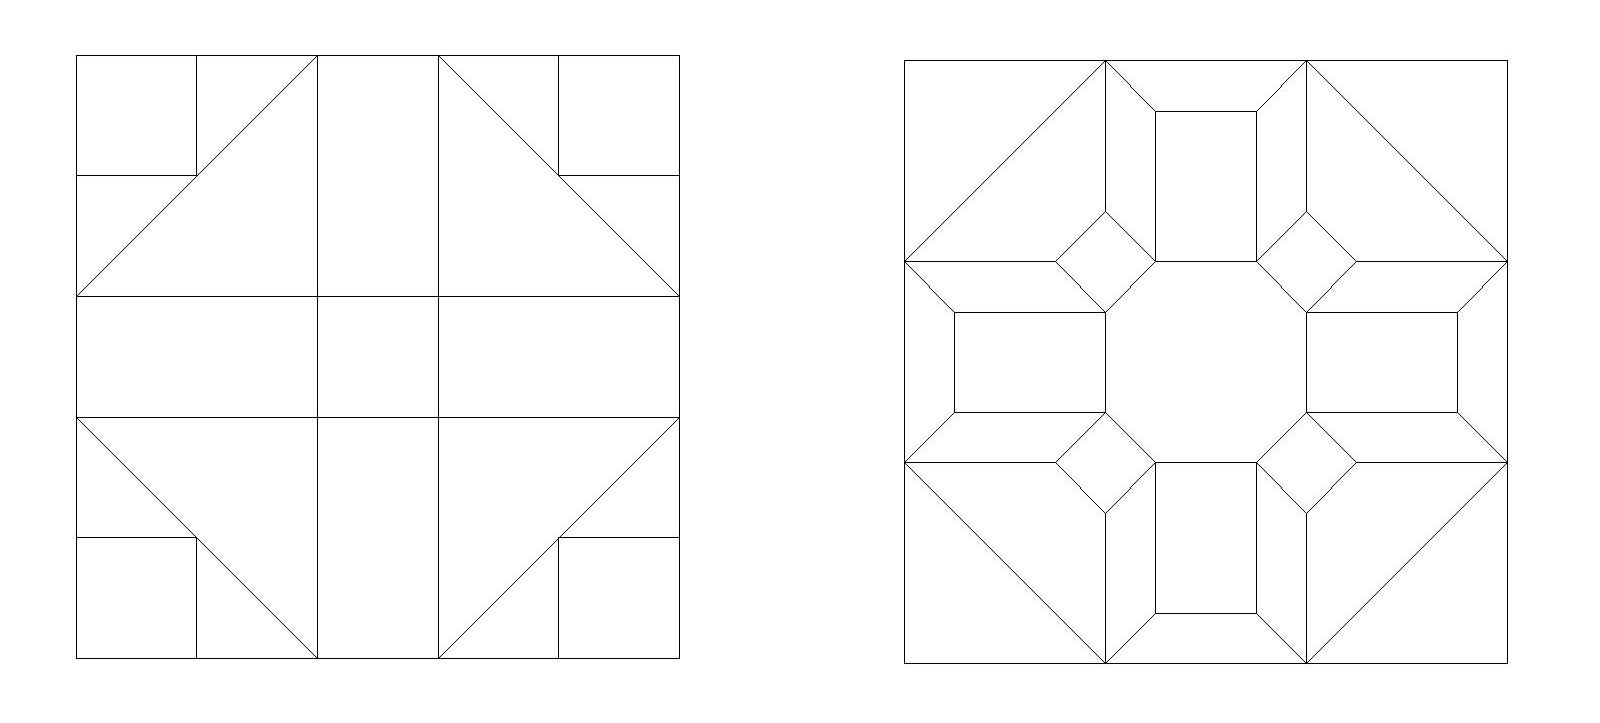 Easy Barn Quilt Patterns To Make Joy Studio Design